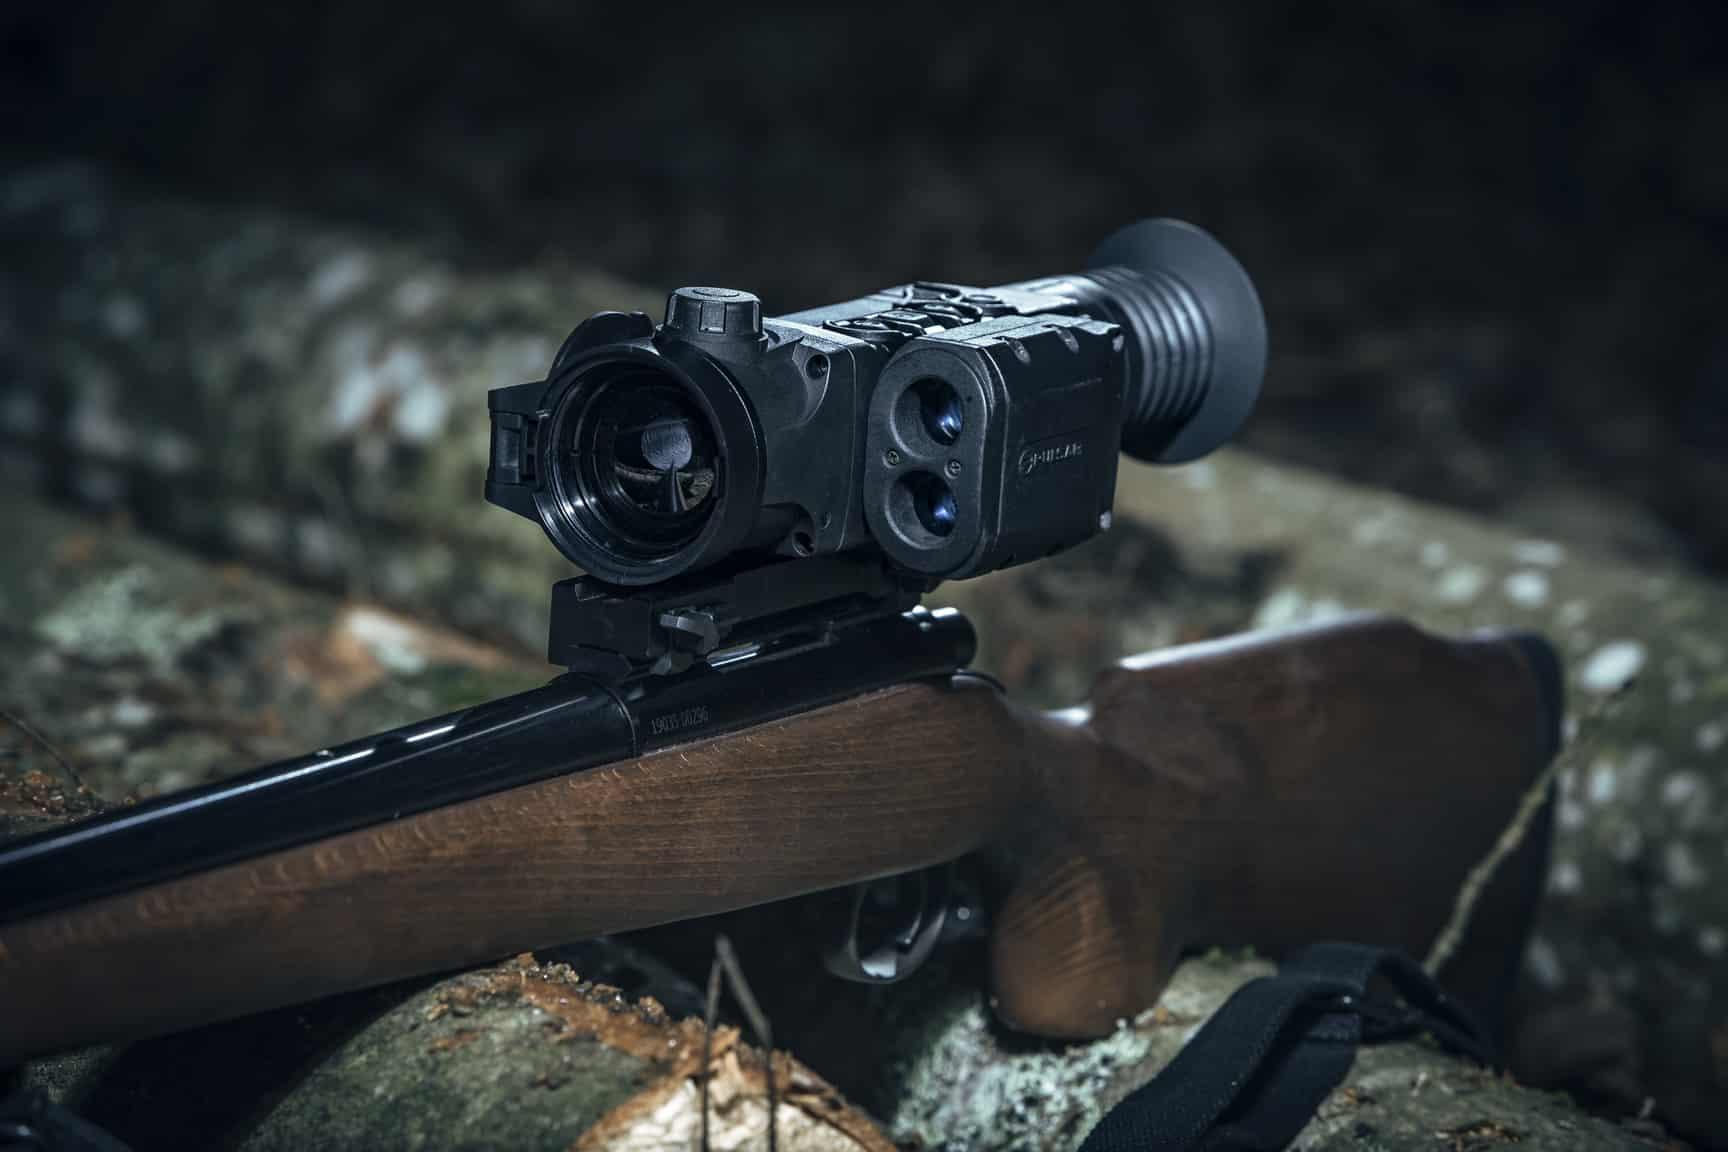 Pulsar Trail LRF XQ50 Thermal Riflescope shooting 19